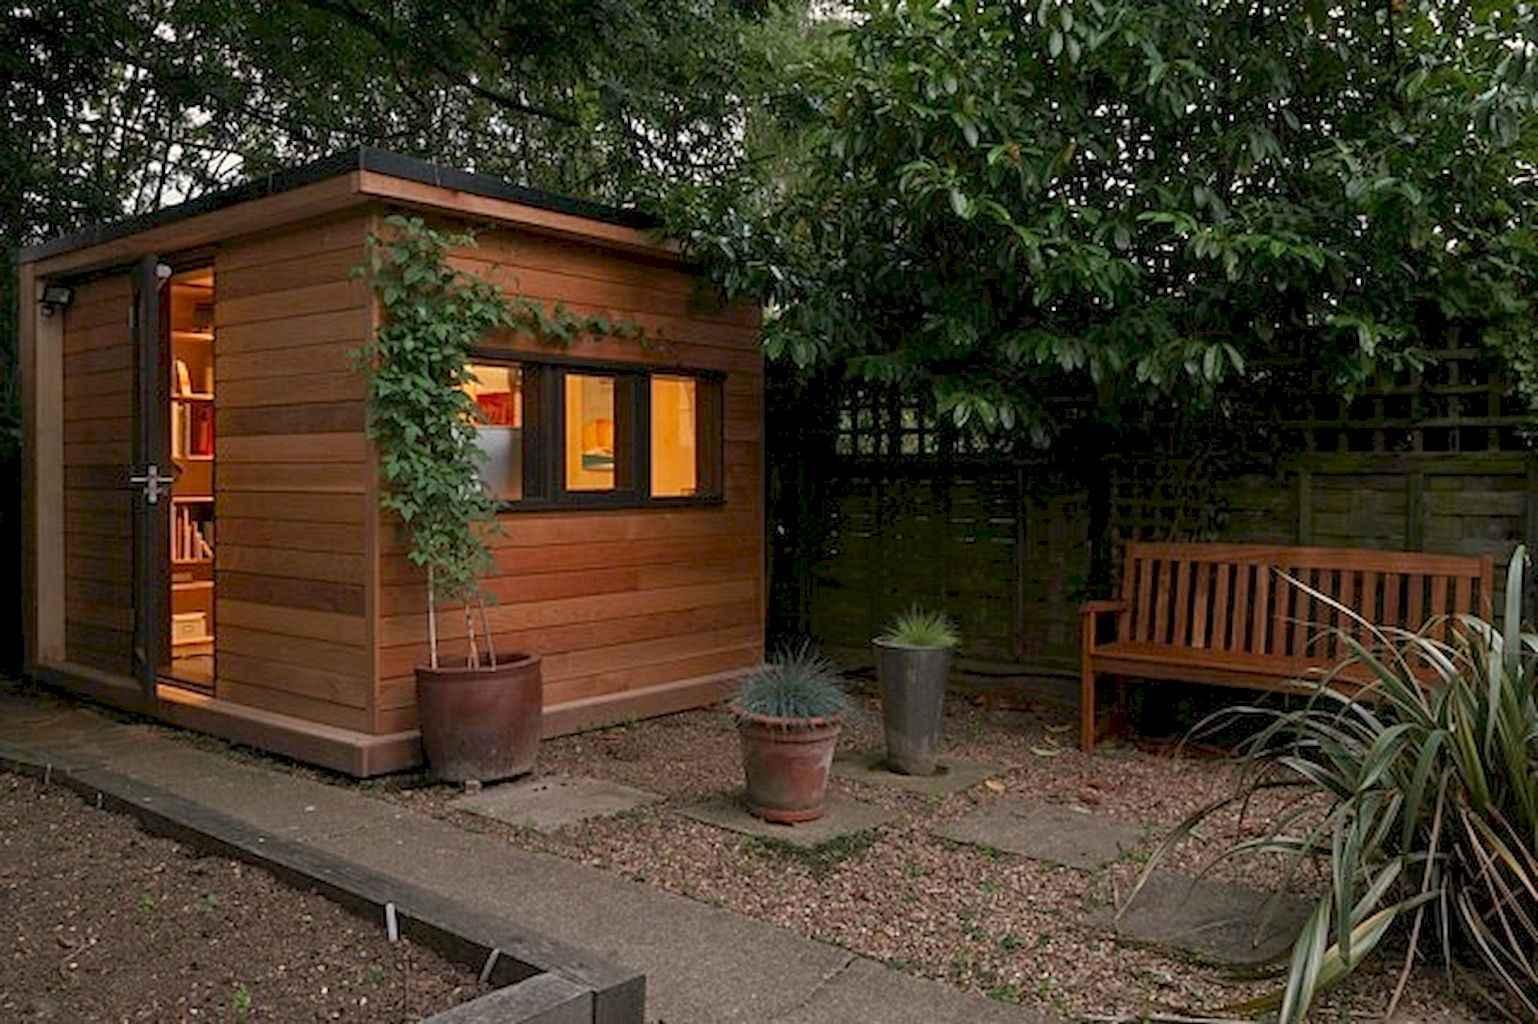 Cool diy backyard studio shed remodel design & decor ideas (52)